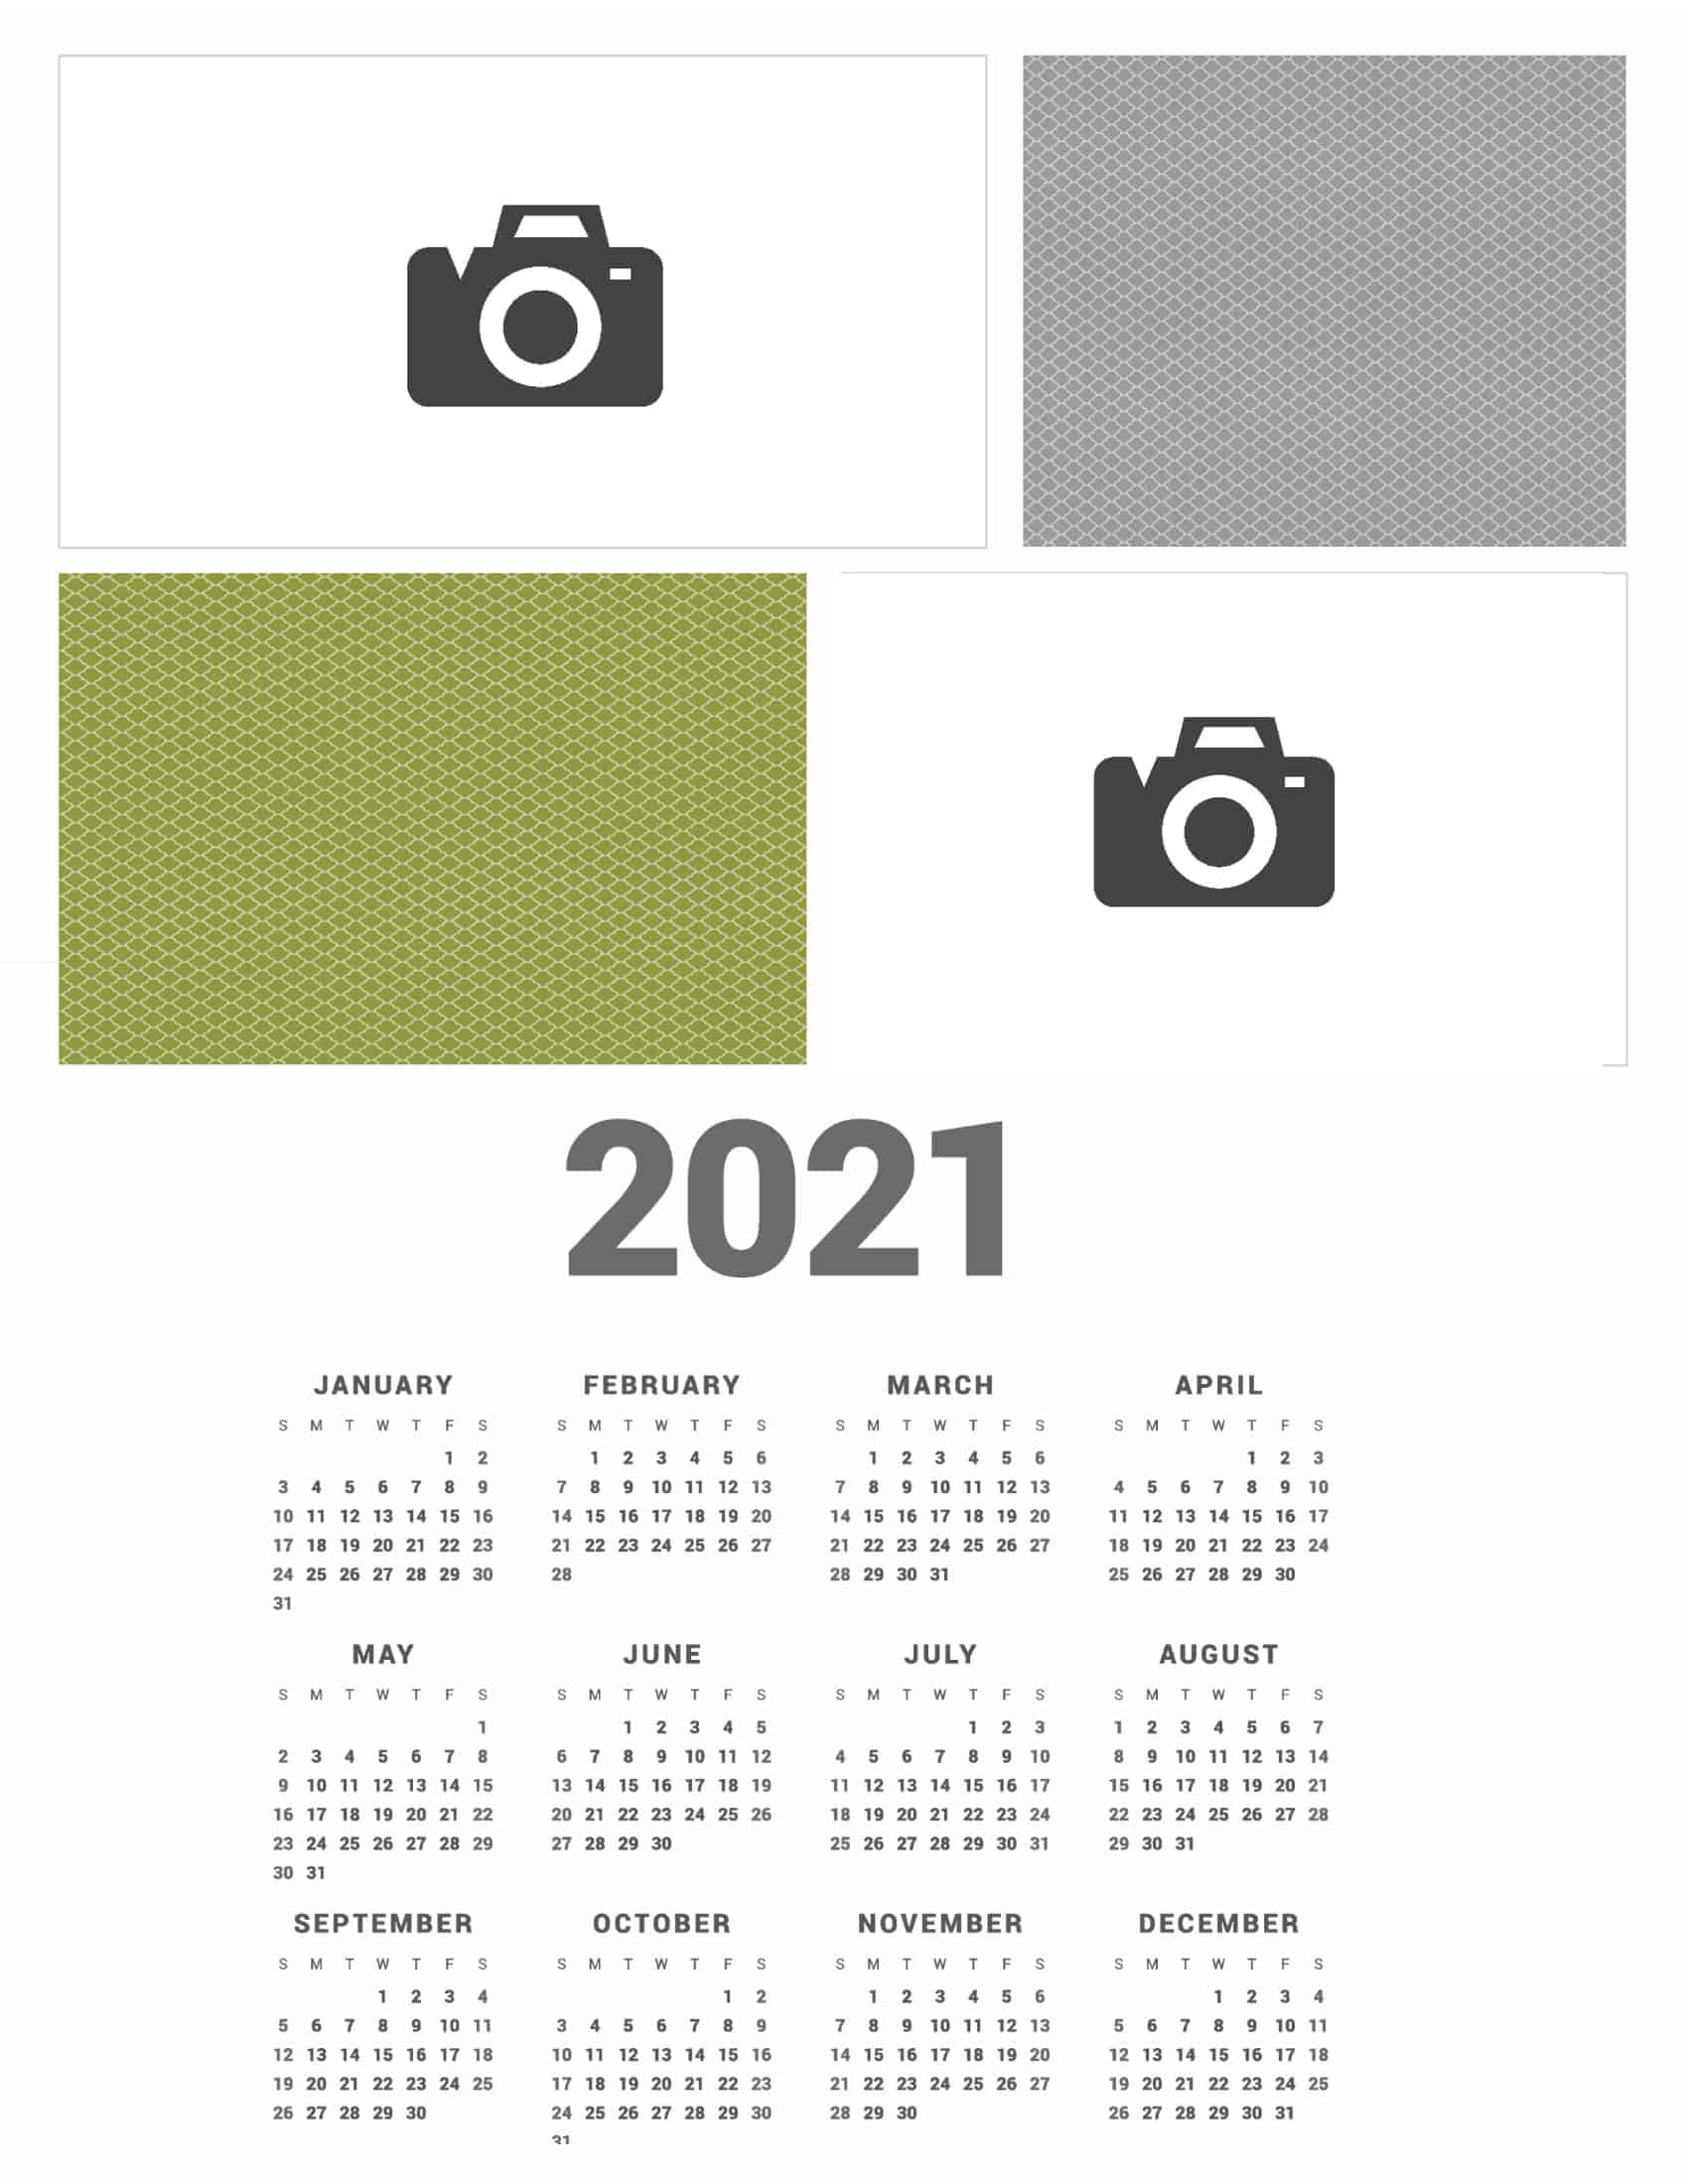 Free Photo Calendar Creator | Create Online & Print At Home